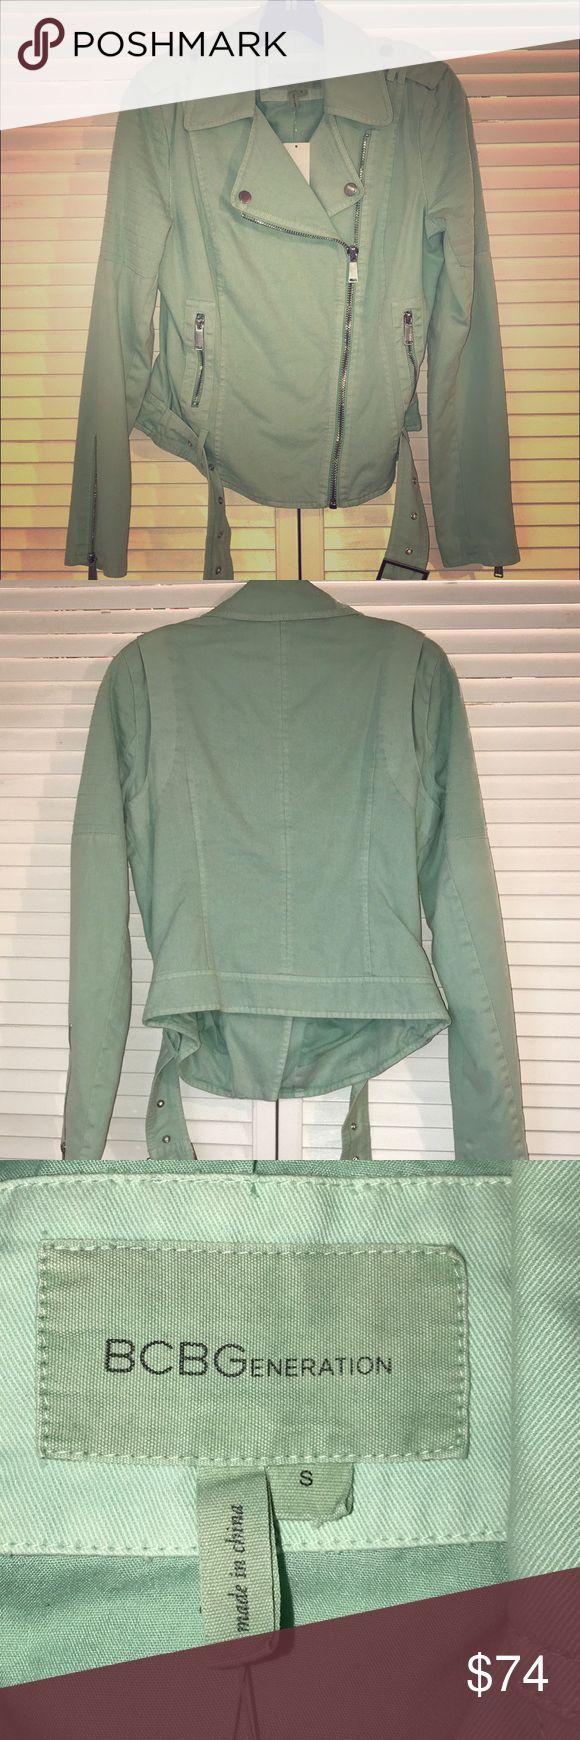 NWT Bcbg generation denim jacket •teal/mint color •denim jacket •zip-up closure and belt •NWT •size: small BCBGeneration Jackets & Coats Jean Jackets